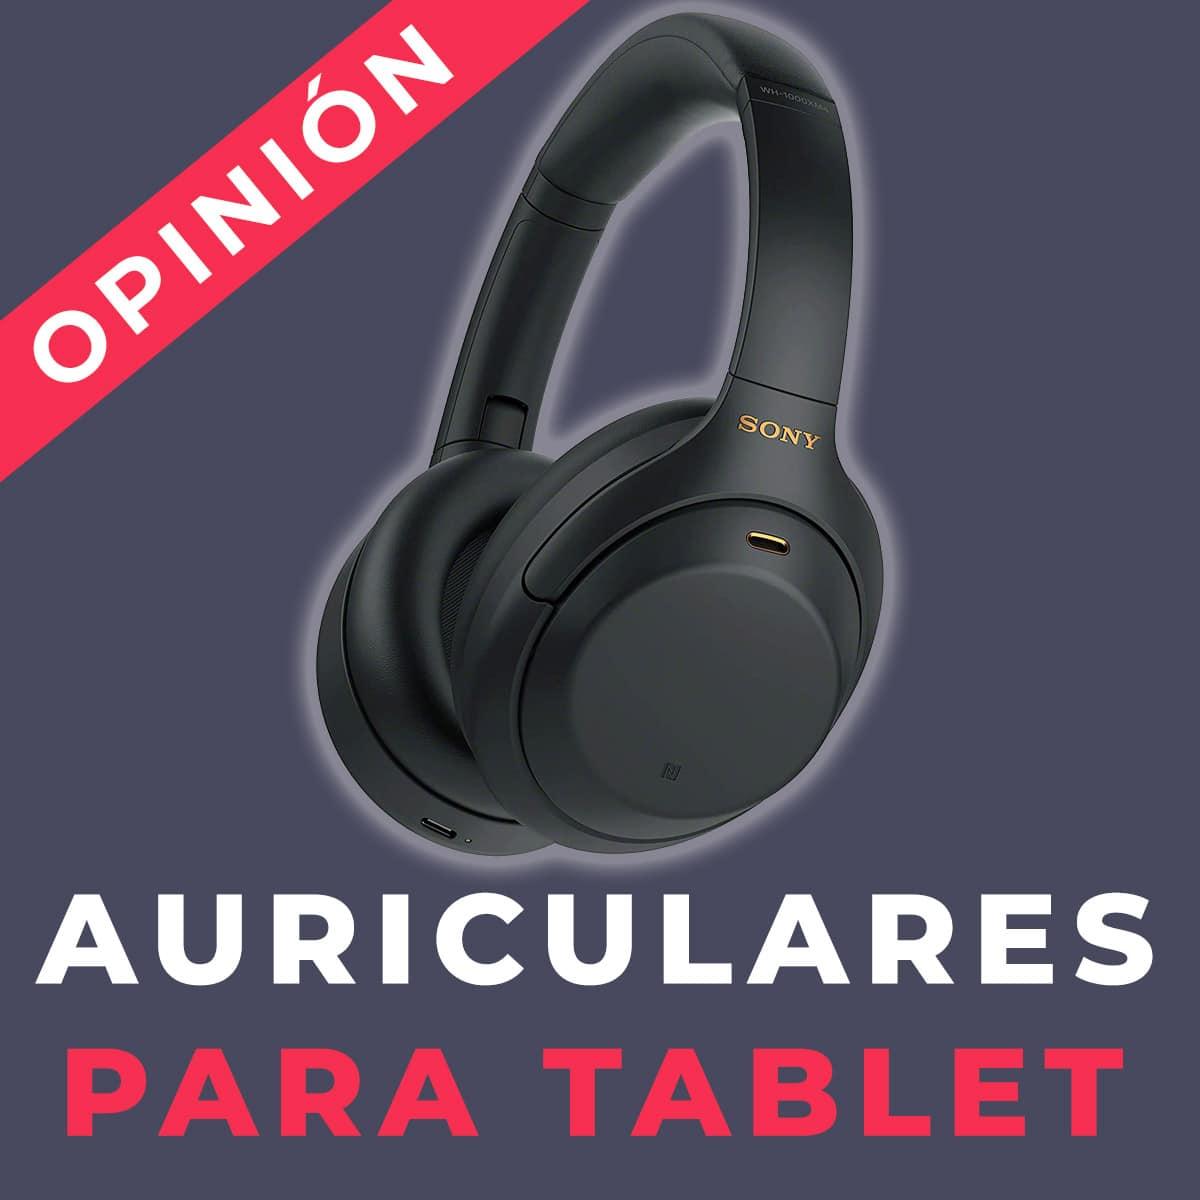 auriculares para tablet